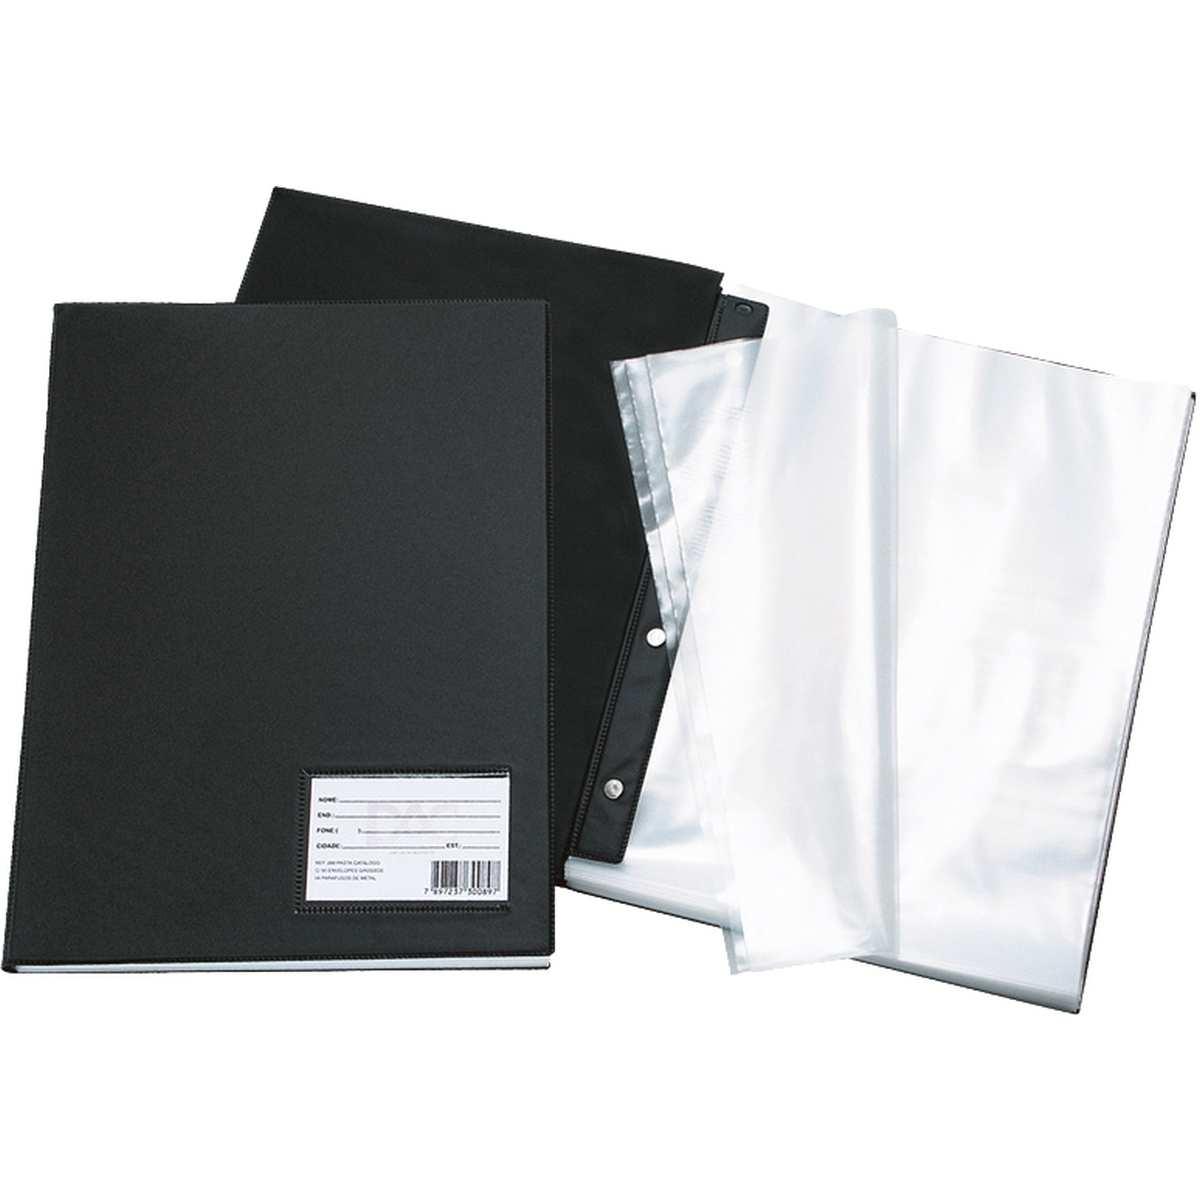 Pasta Catalogo - Oficio c/100 Envelopes Finos Preta - Dac